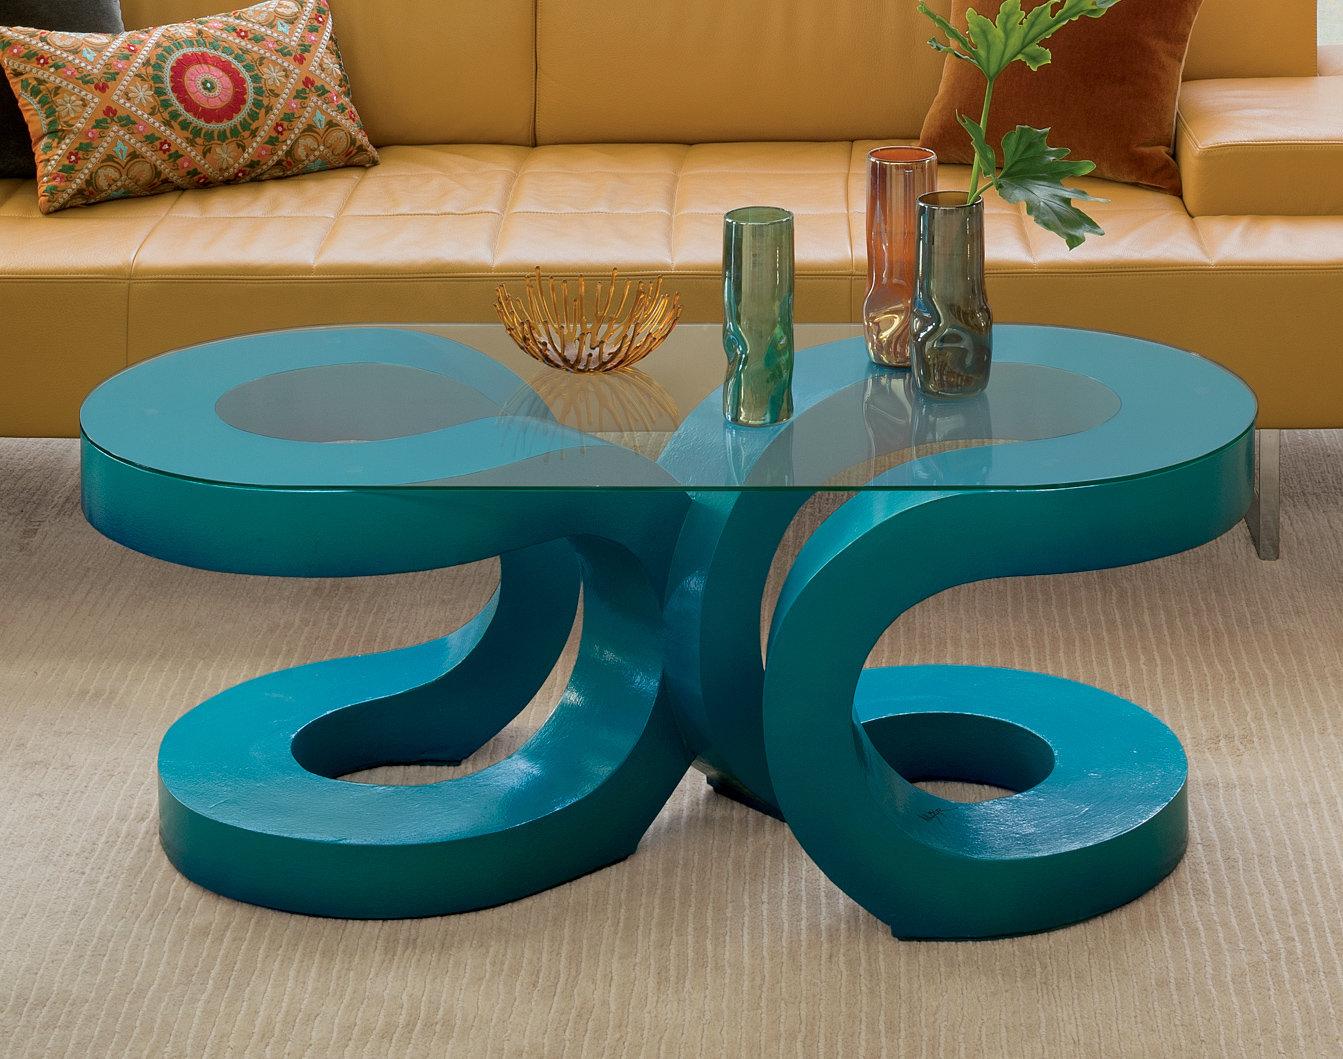 2u coffee table by john wilbar wood coffee table for Teal coffee table